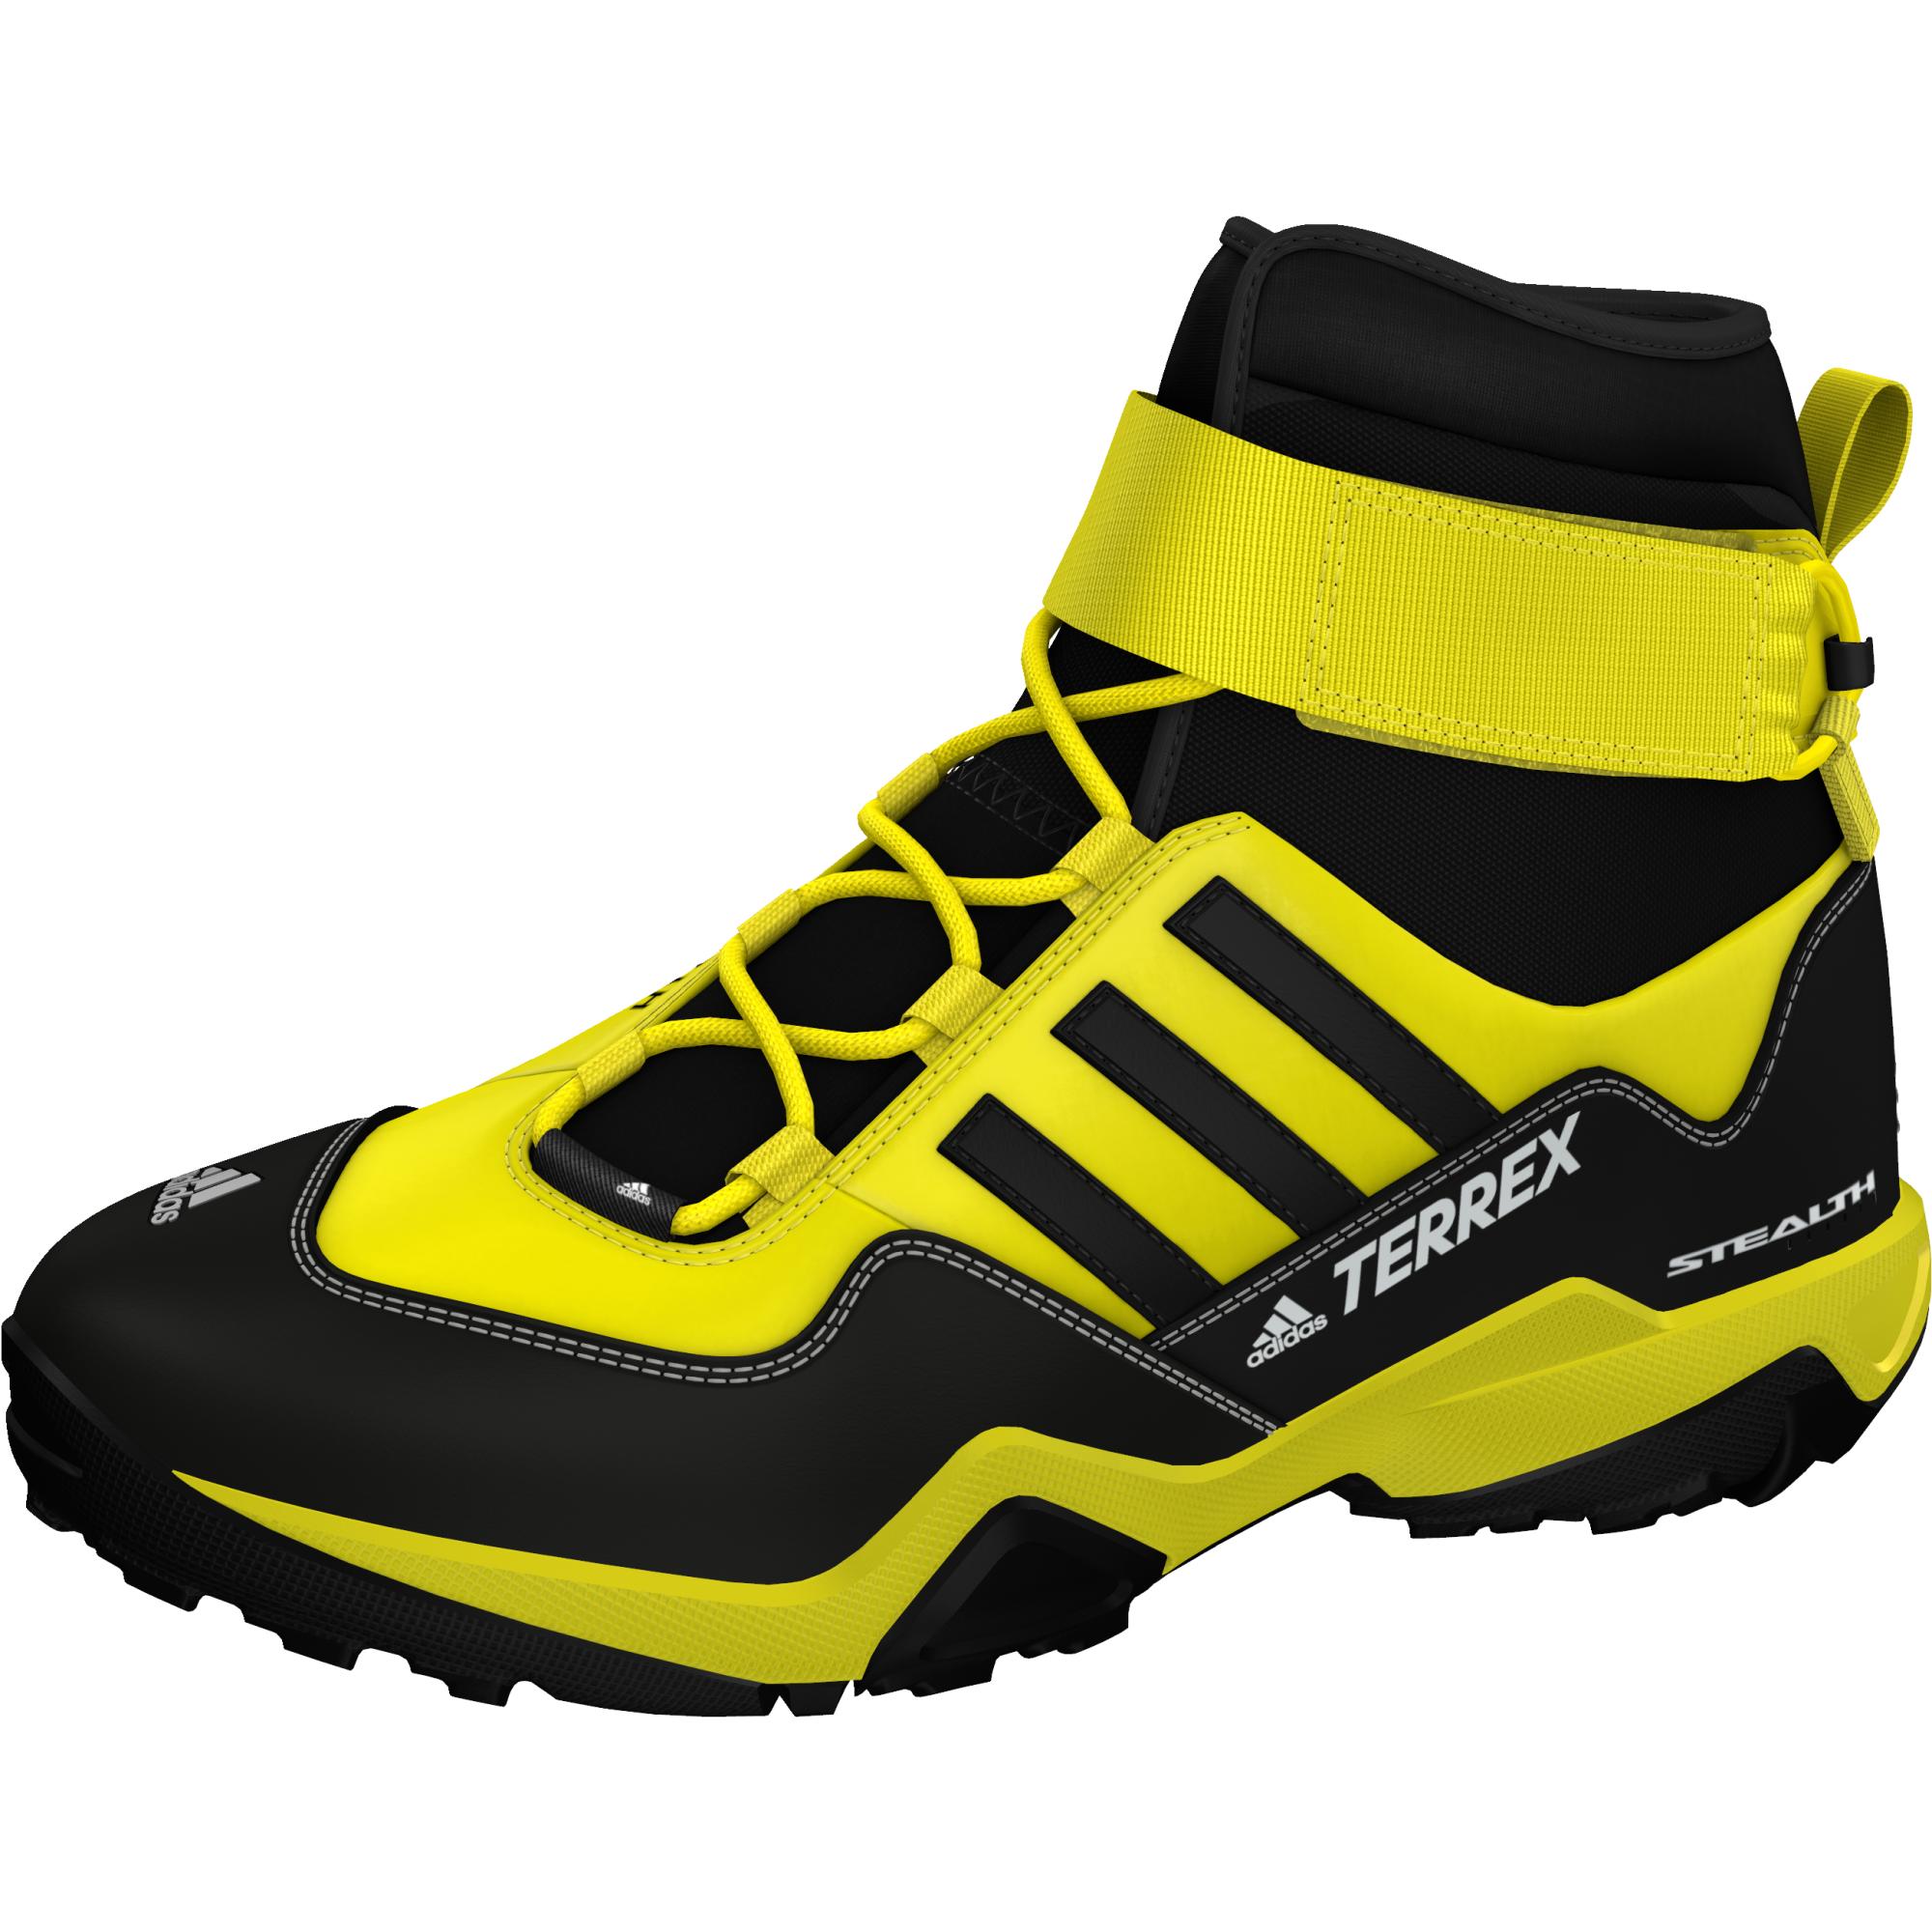 Canyoningschuh Adidas Hydro Lace 2017 00023